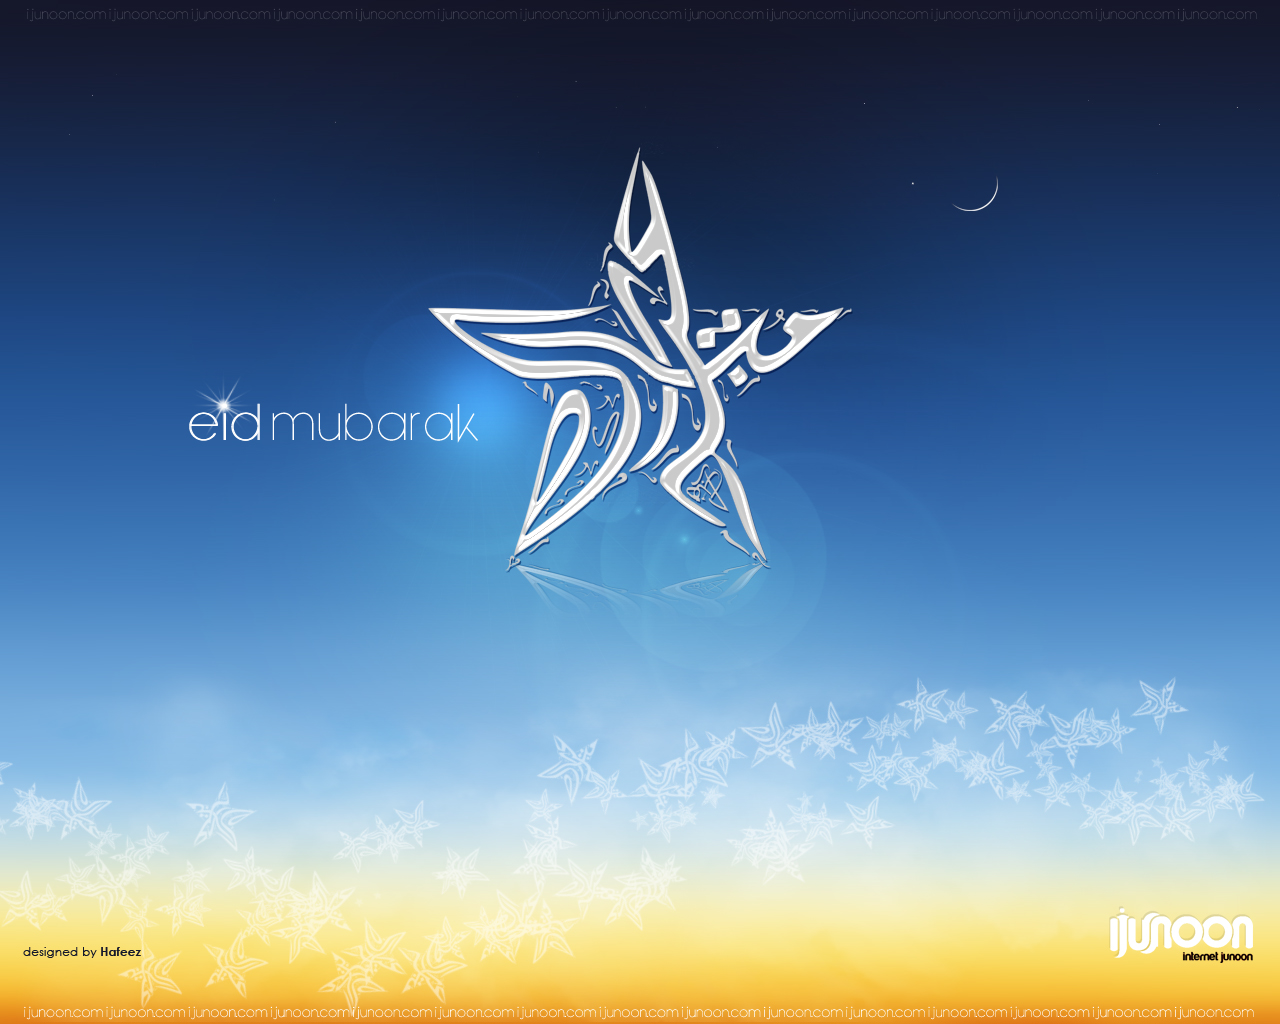 Eid Special Wallpaper